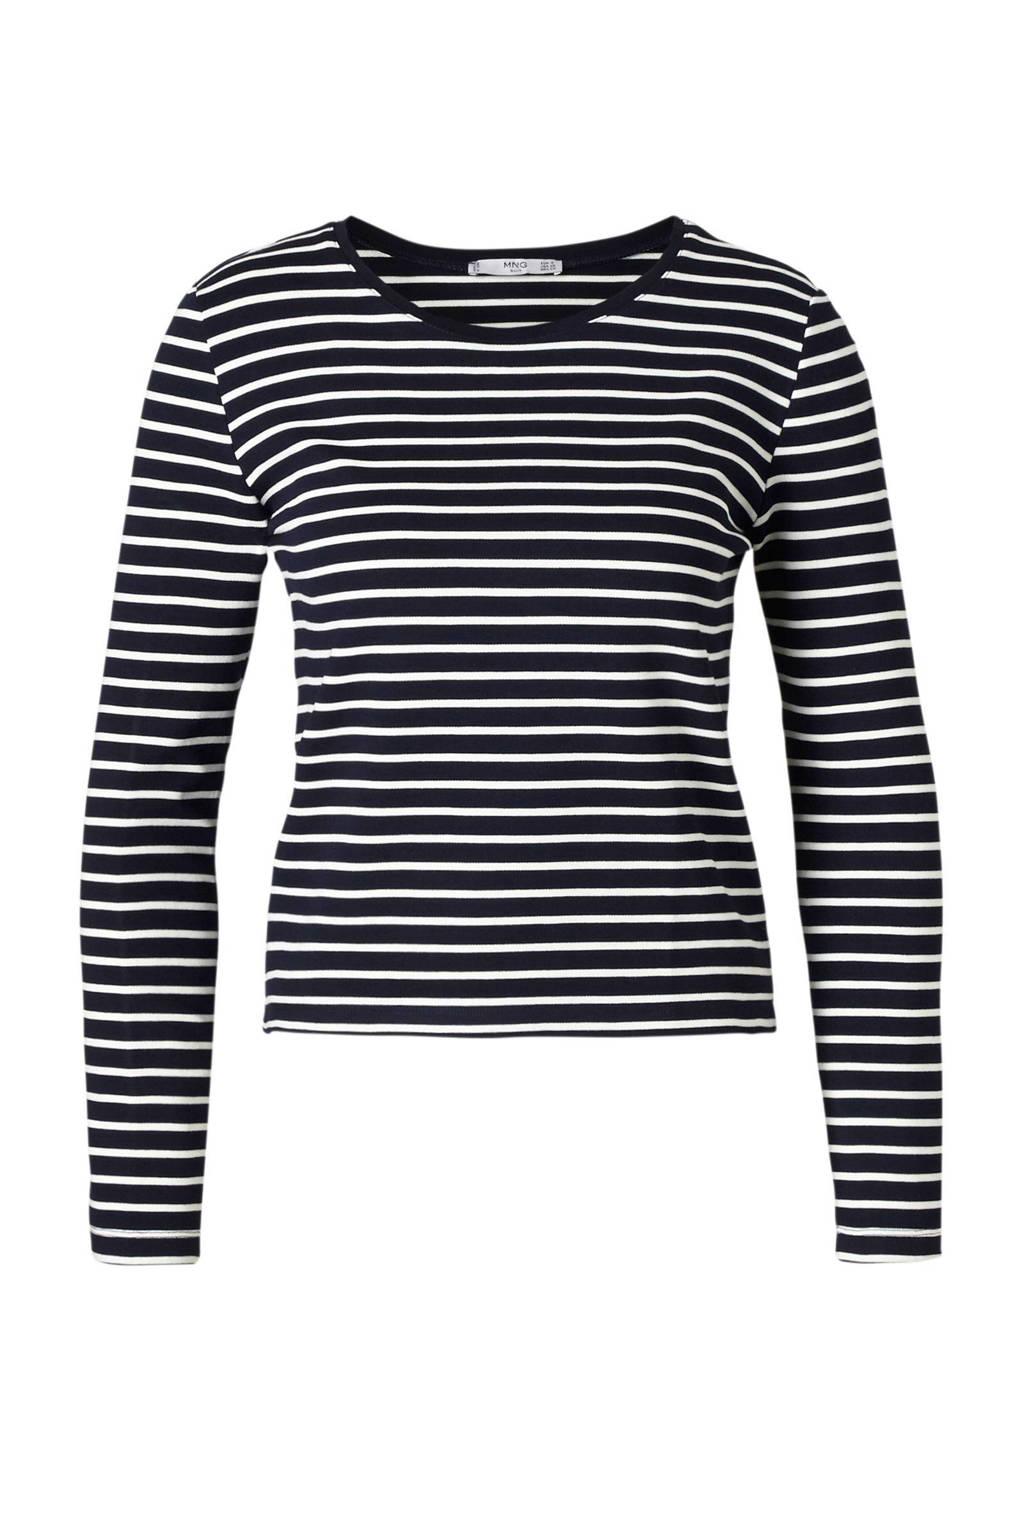 Mango T-shirt, Donkerblauw/wit